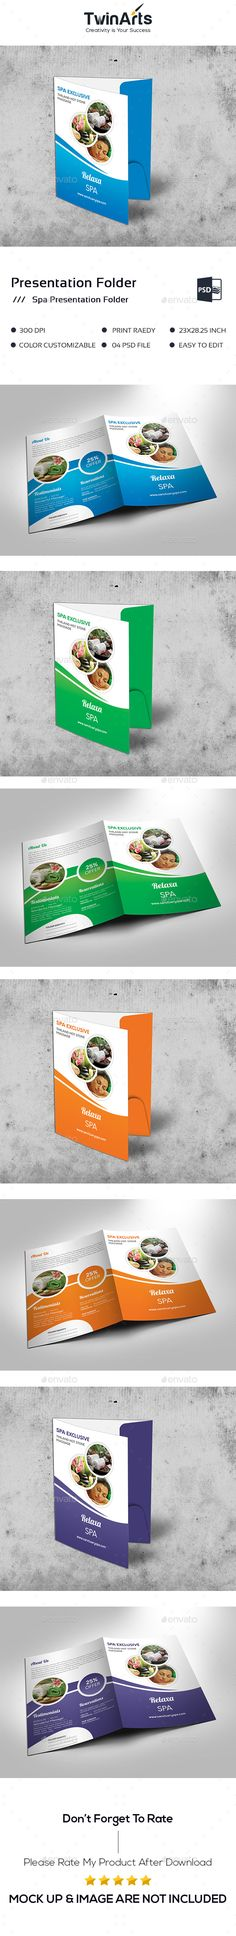 Spa Presentation Folder